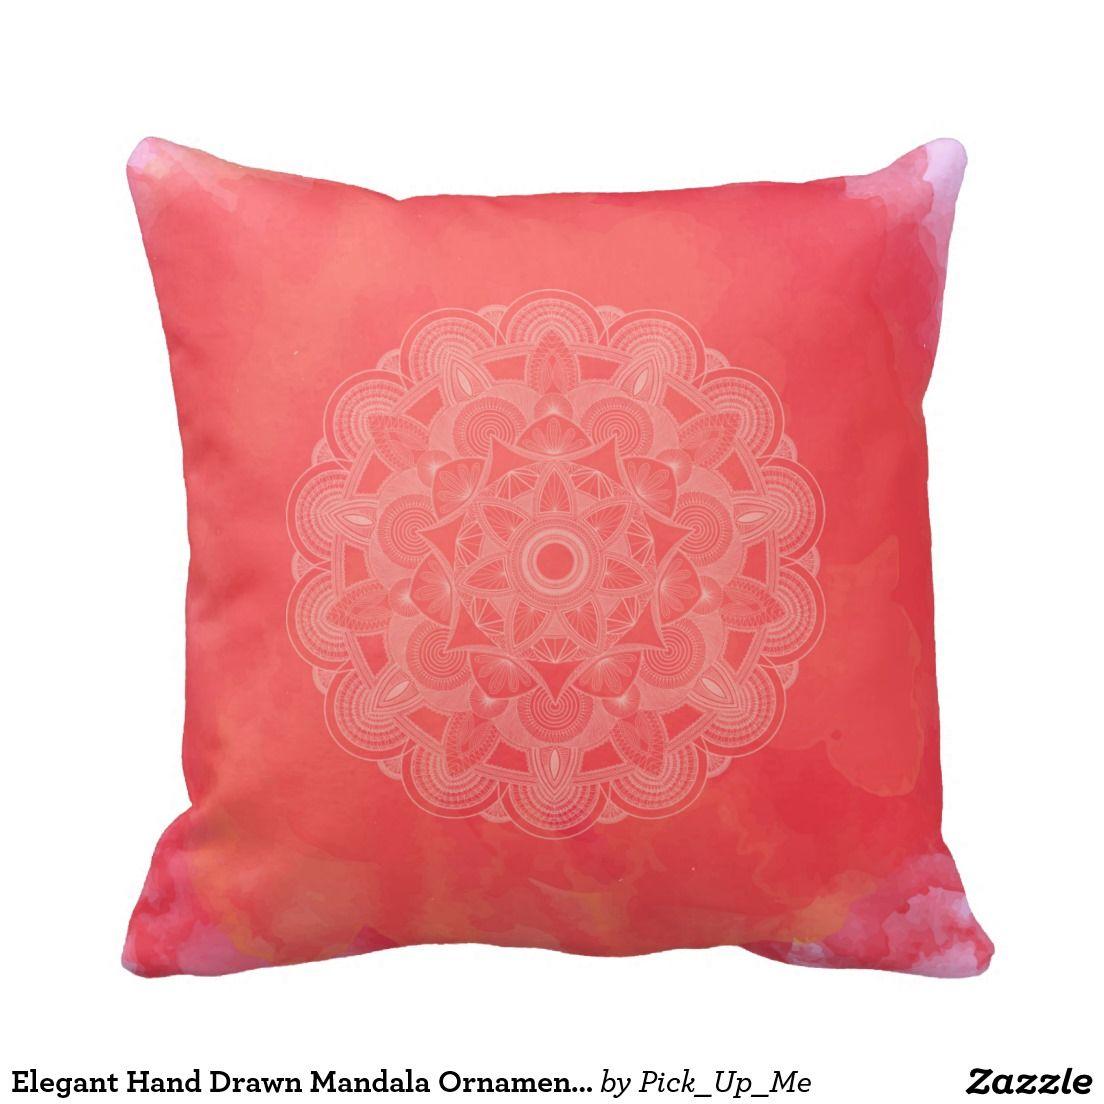 Elegant Hand Drawn Mandala Ornament Throw Pillows